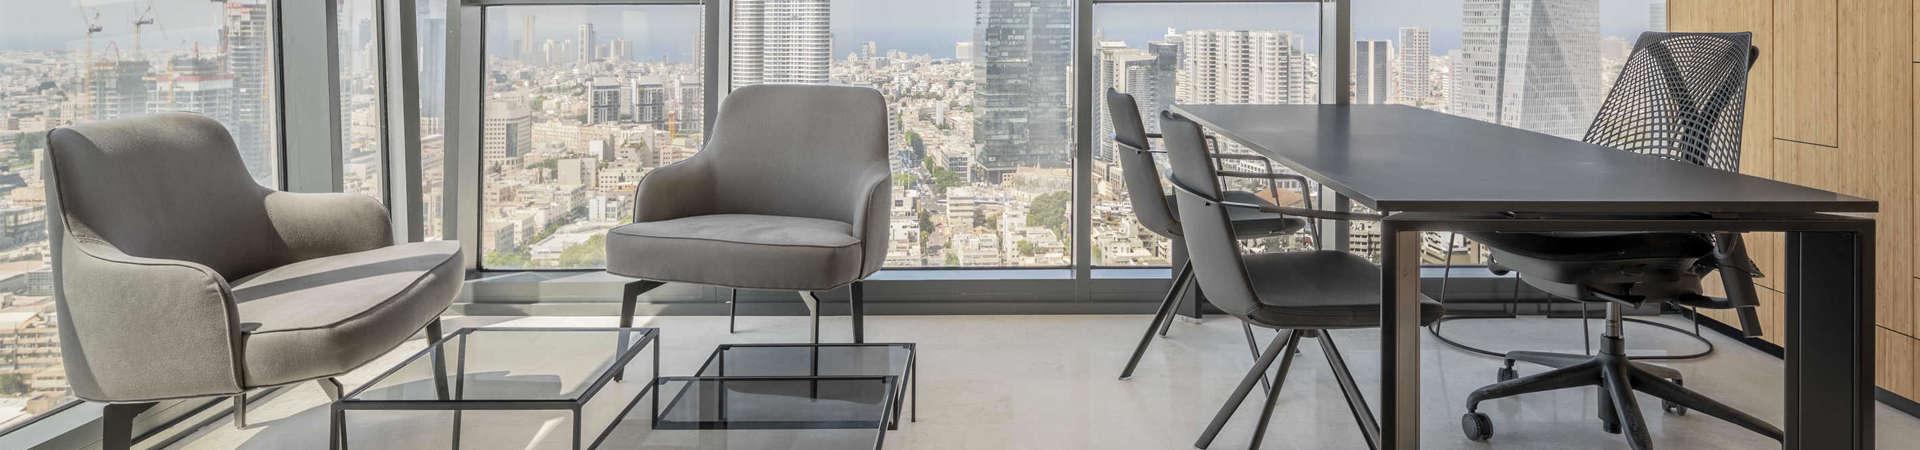 webiz חלל עבודה בתל אביב